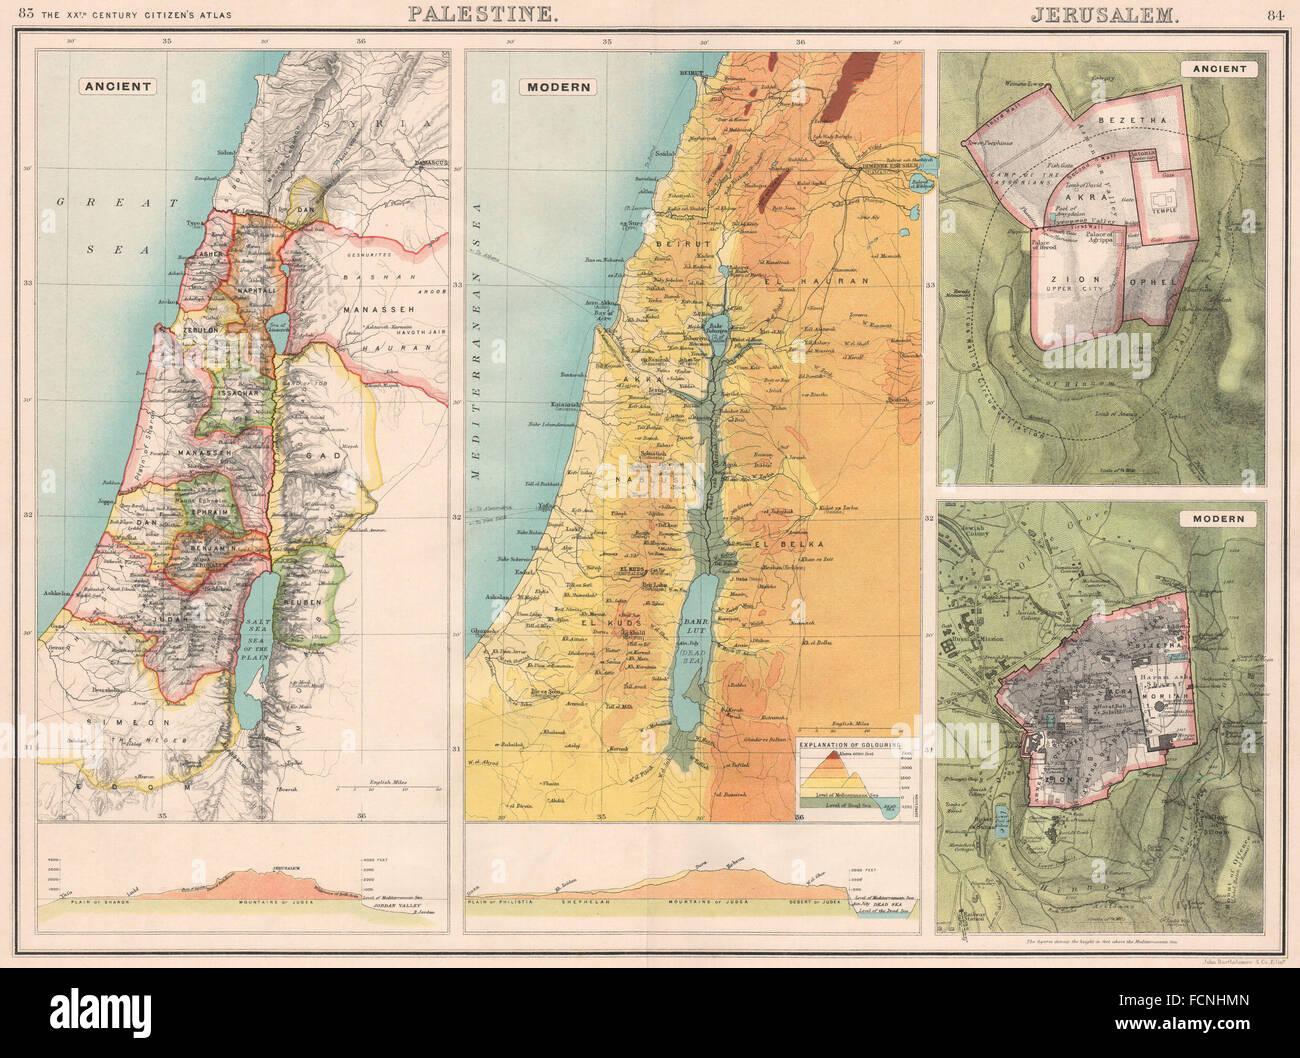 Palestine jerusalem 12 tribes of israel w e sections relief map palestine jerusalem 12 tribes of israel w e sections relief map 1901 gumiabroncs Choice Image